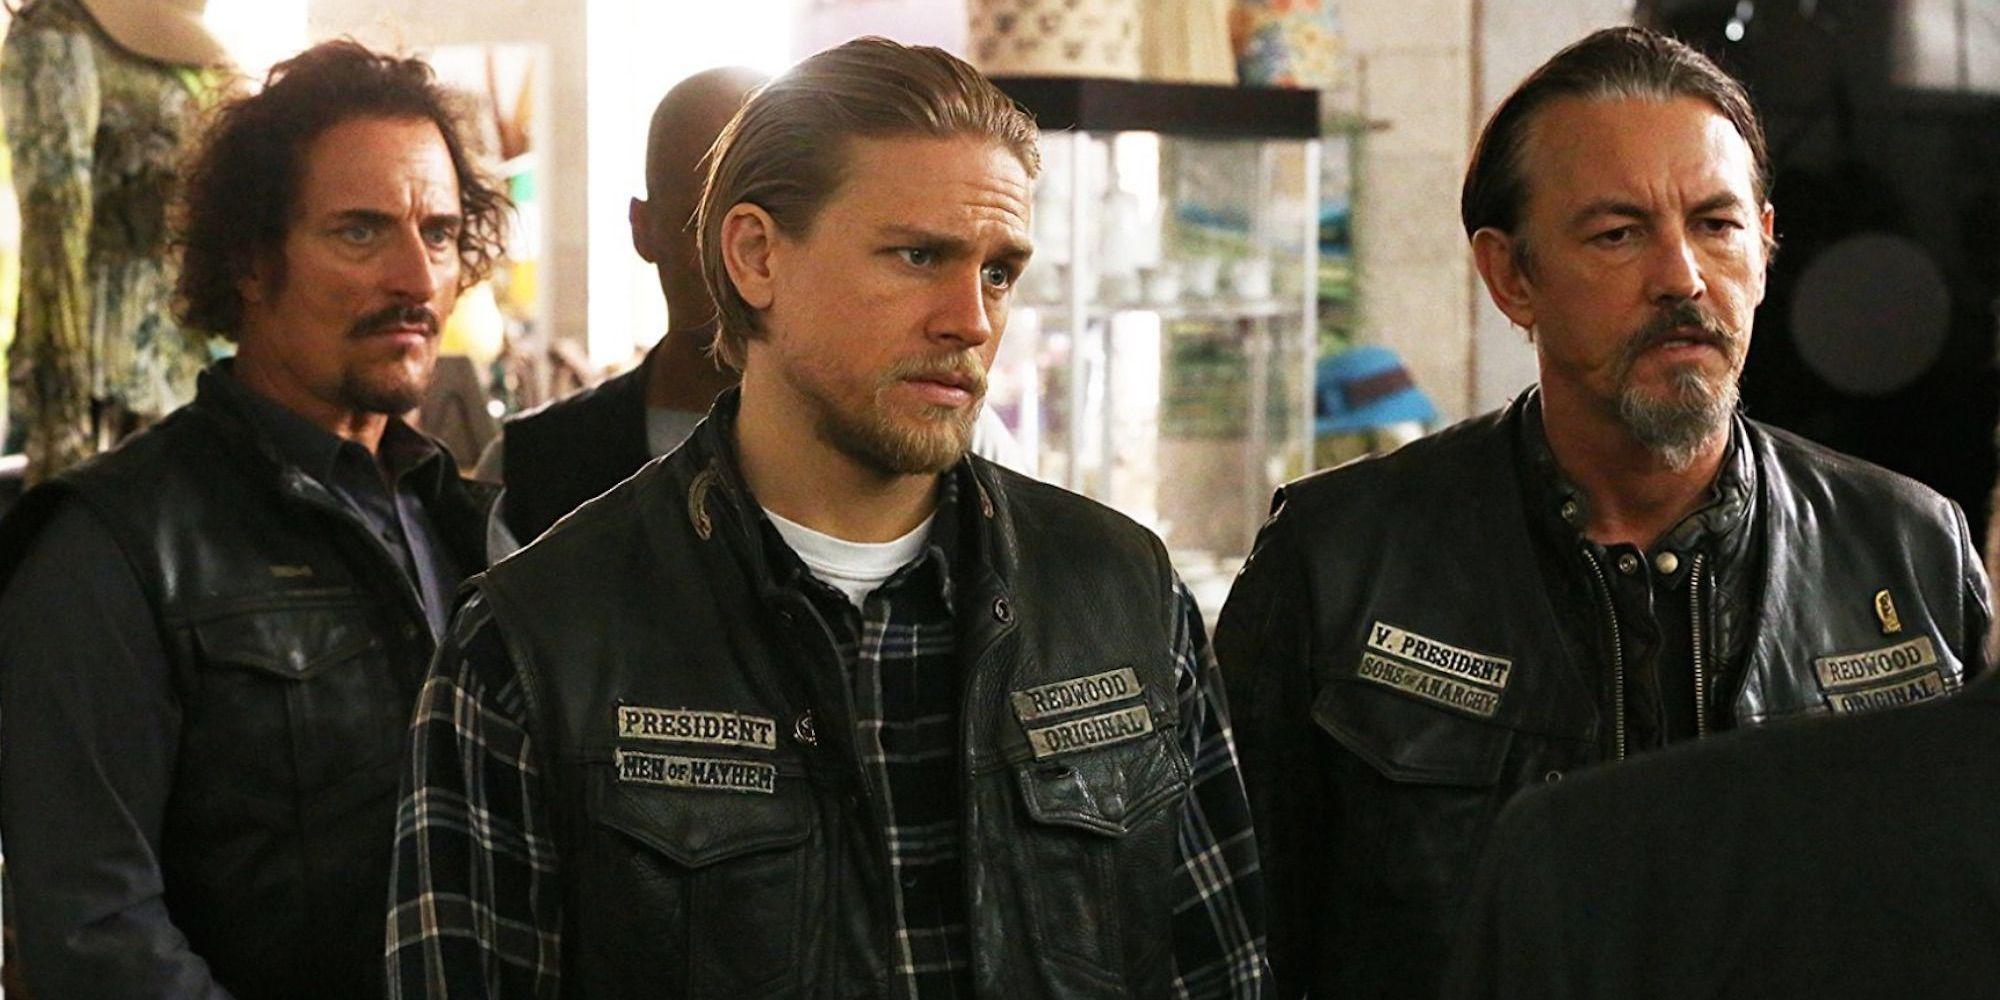 Why Sons of Anarchy's Series Finale Kills Jax Teller | CBR